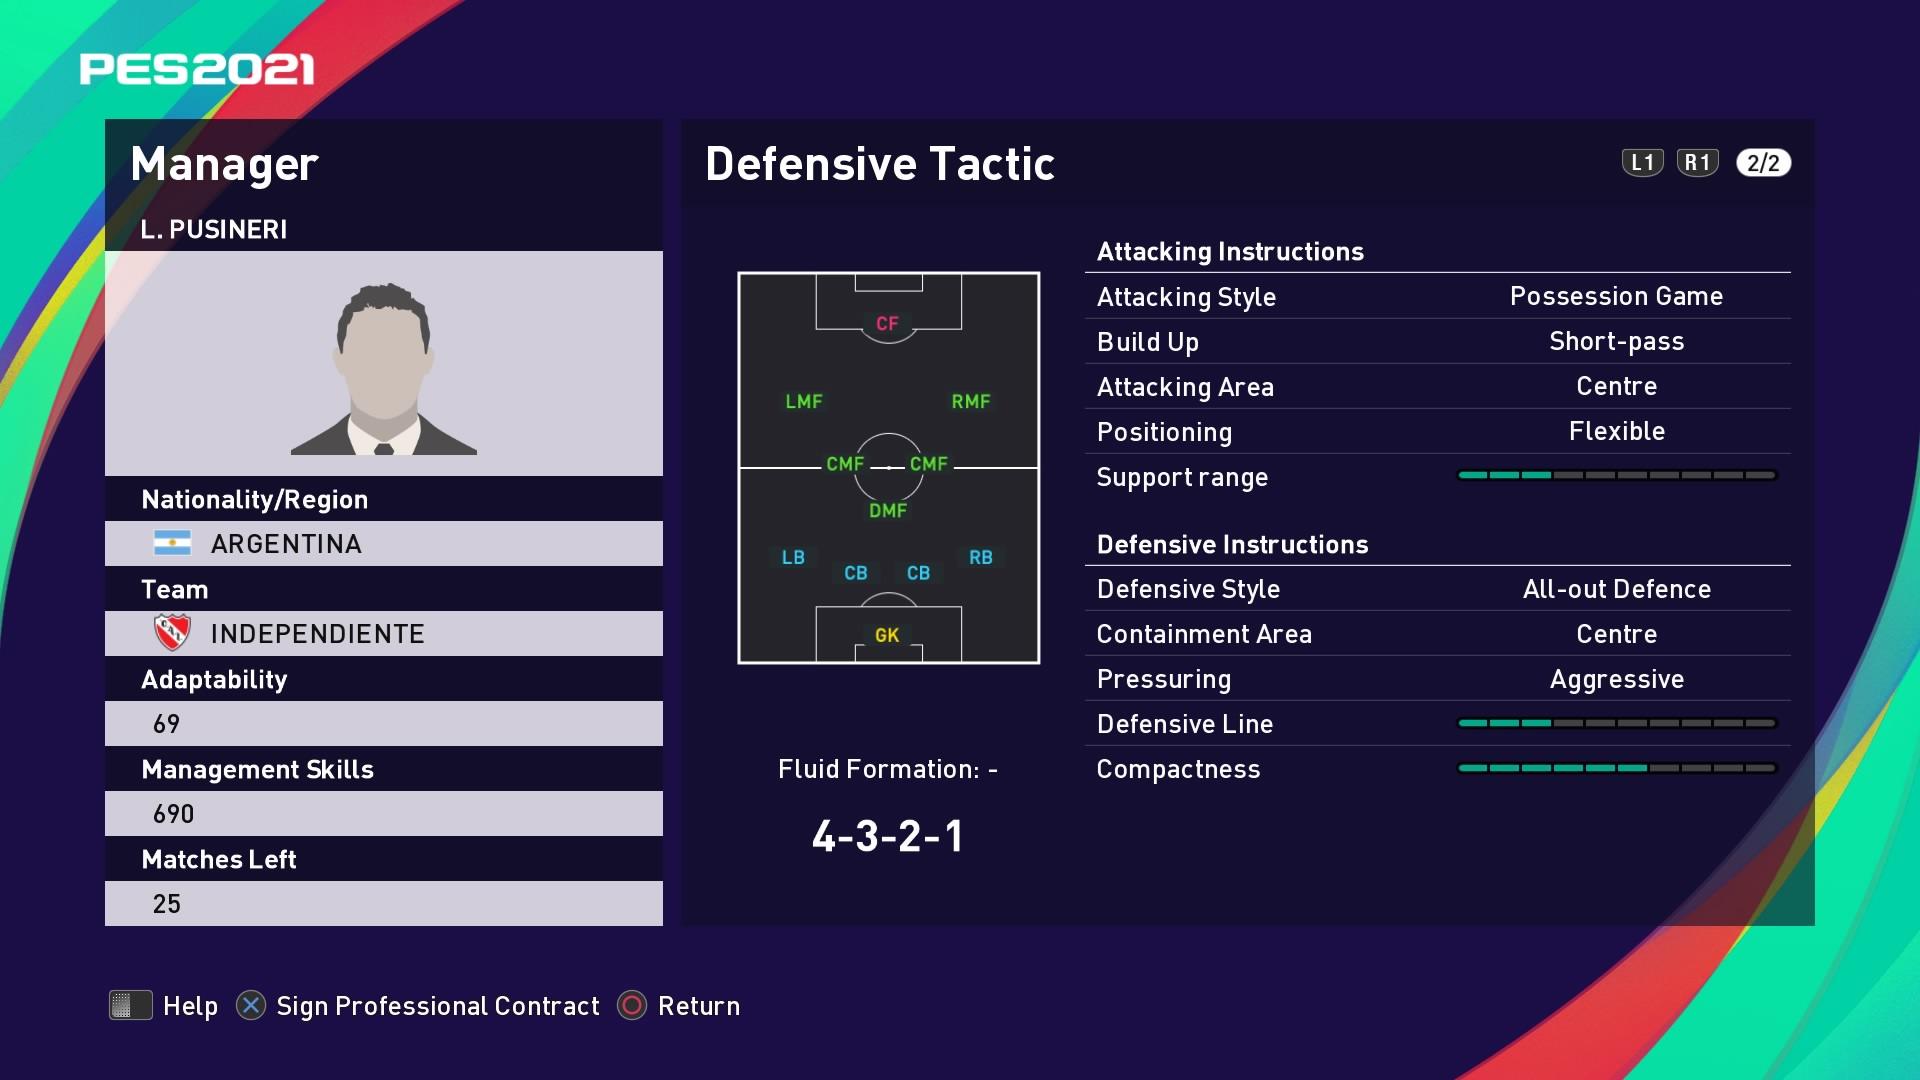 L. Pusineri (Lucas Pusineri) Defensive Tactic in PES 2021 myClub